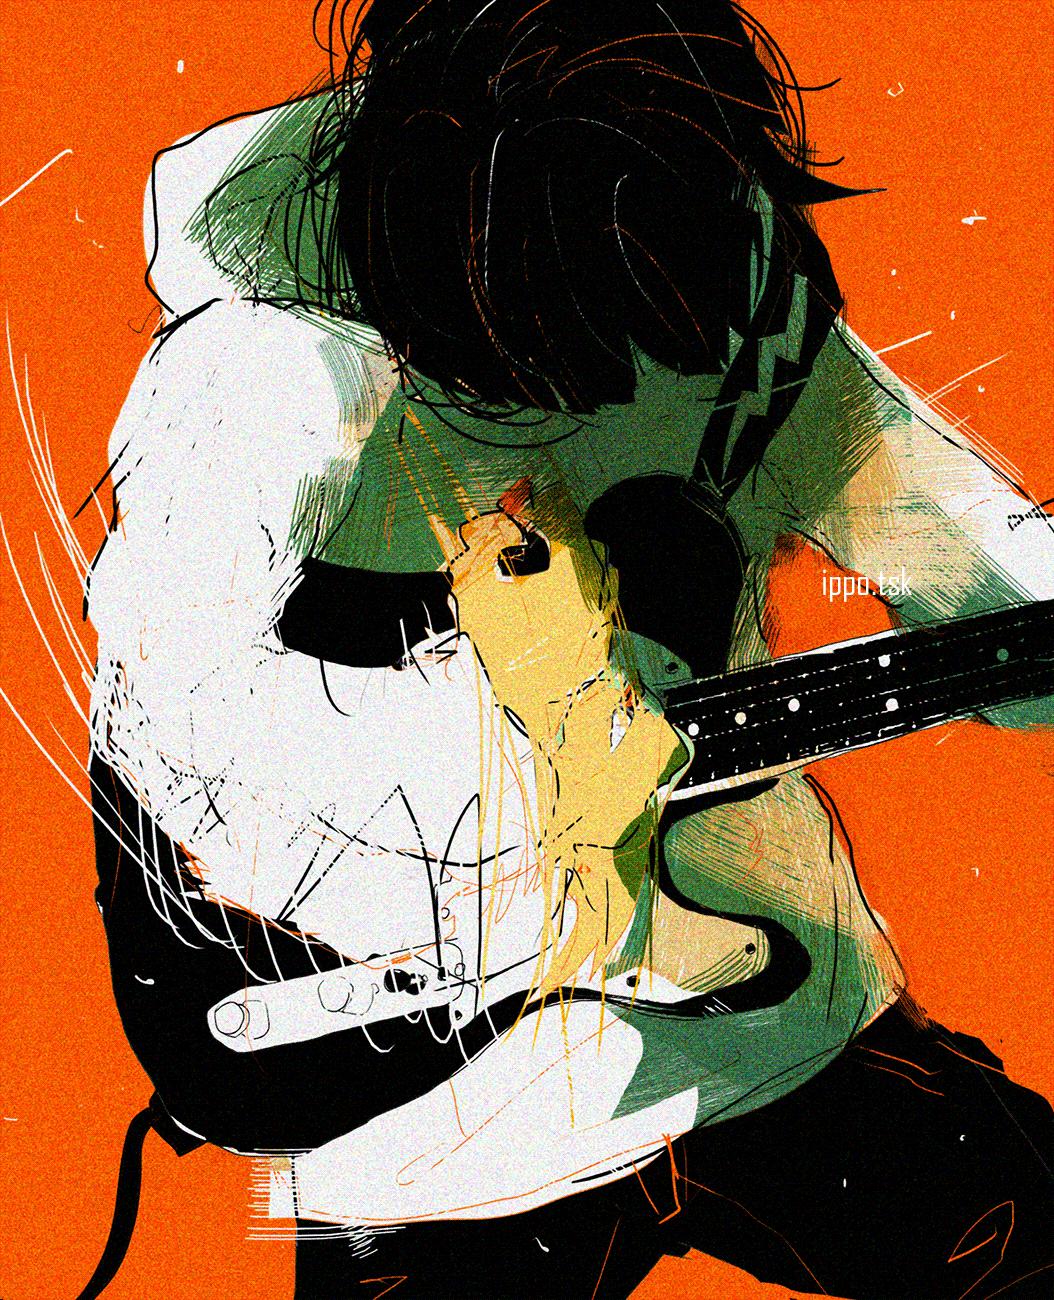 puf-chan22179's DeviantArt favourites